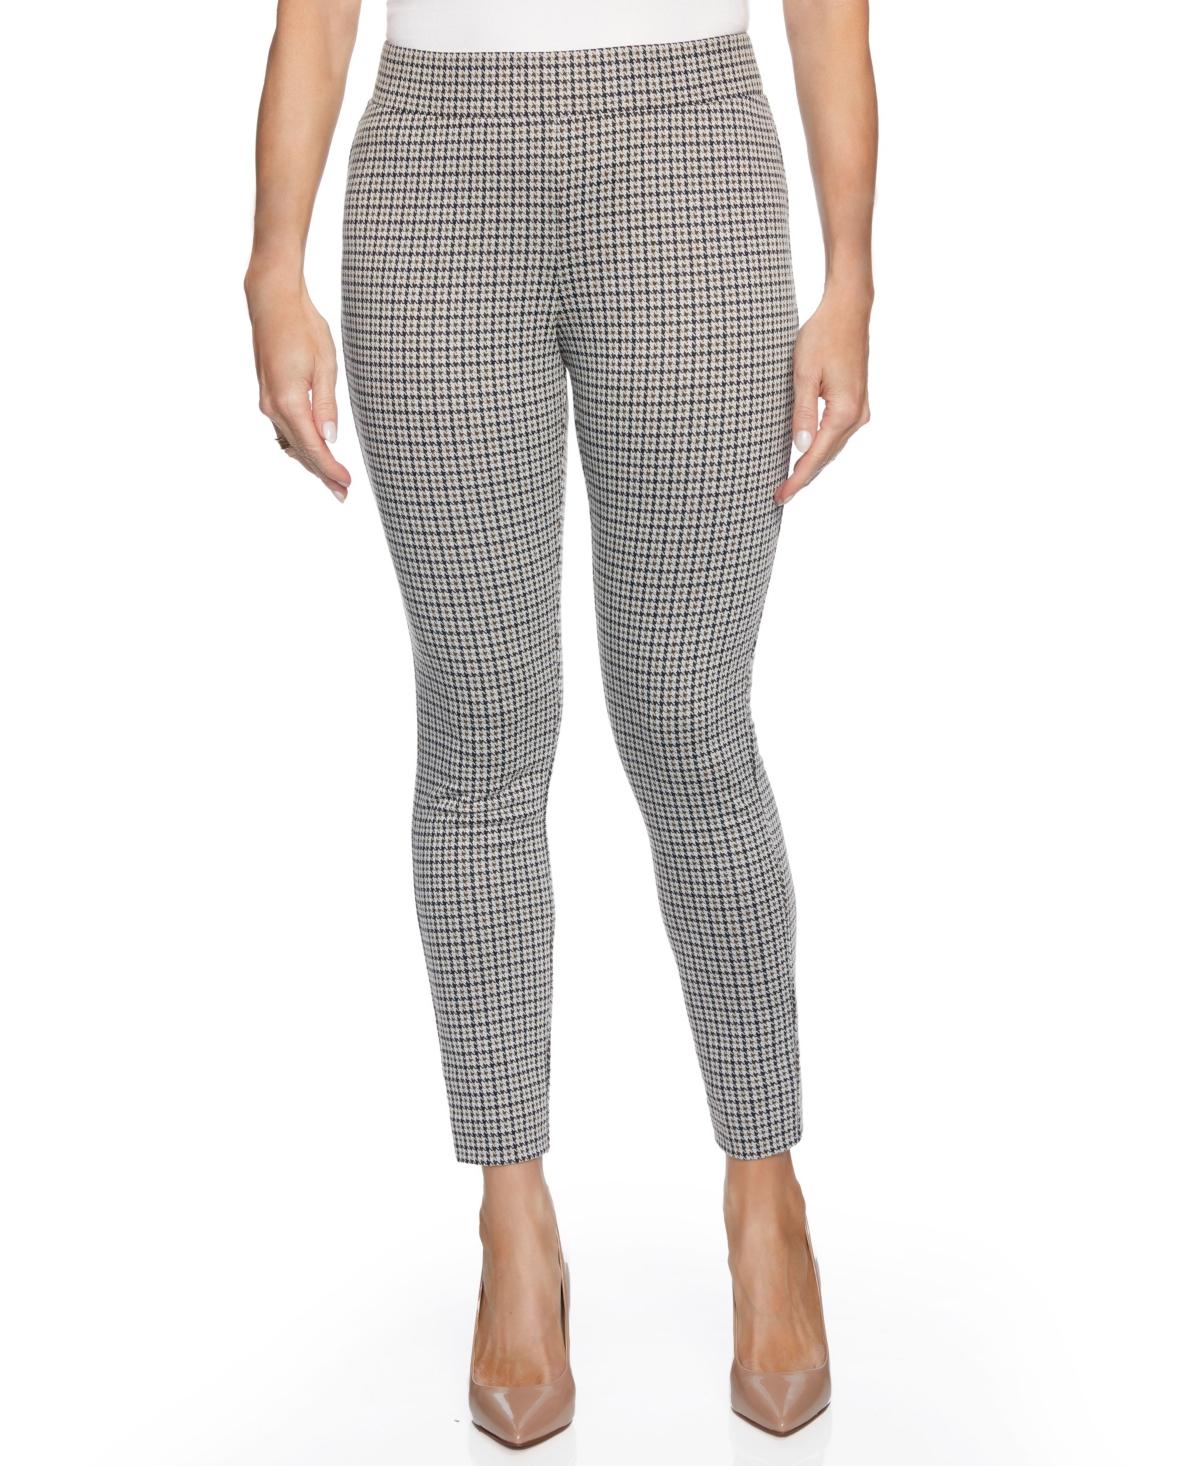 Women's Wide Waistband Skinny Pants